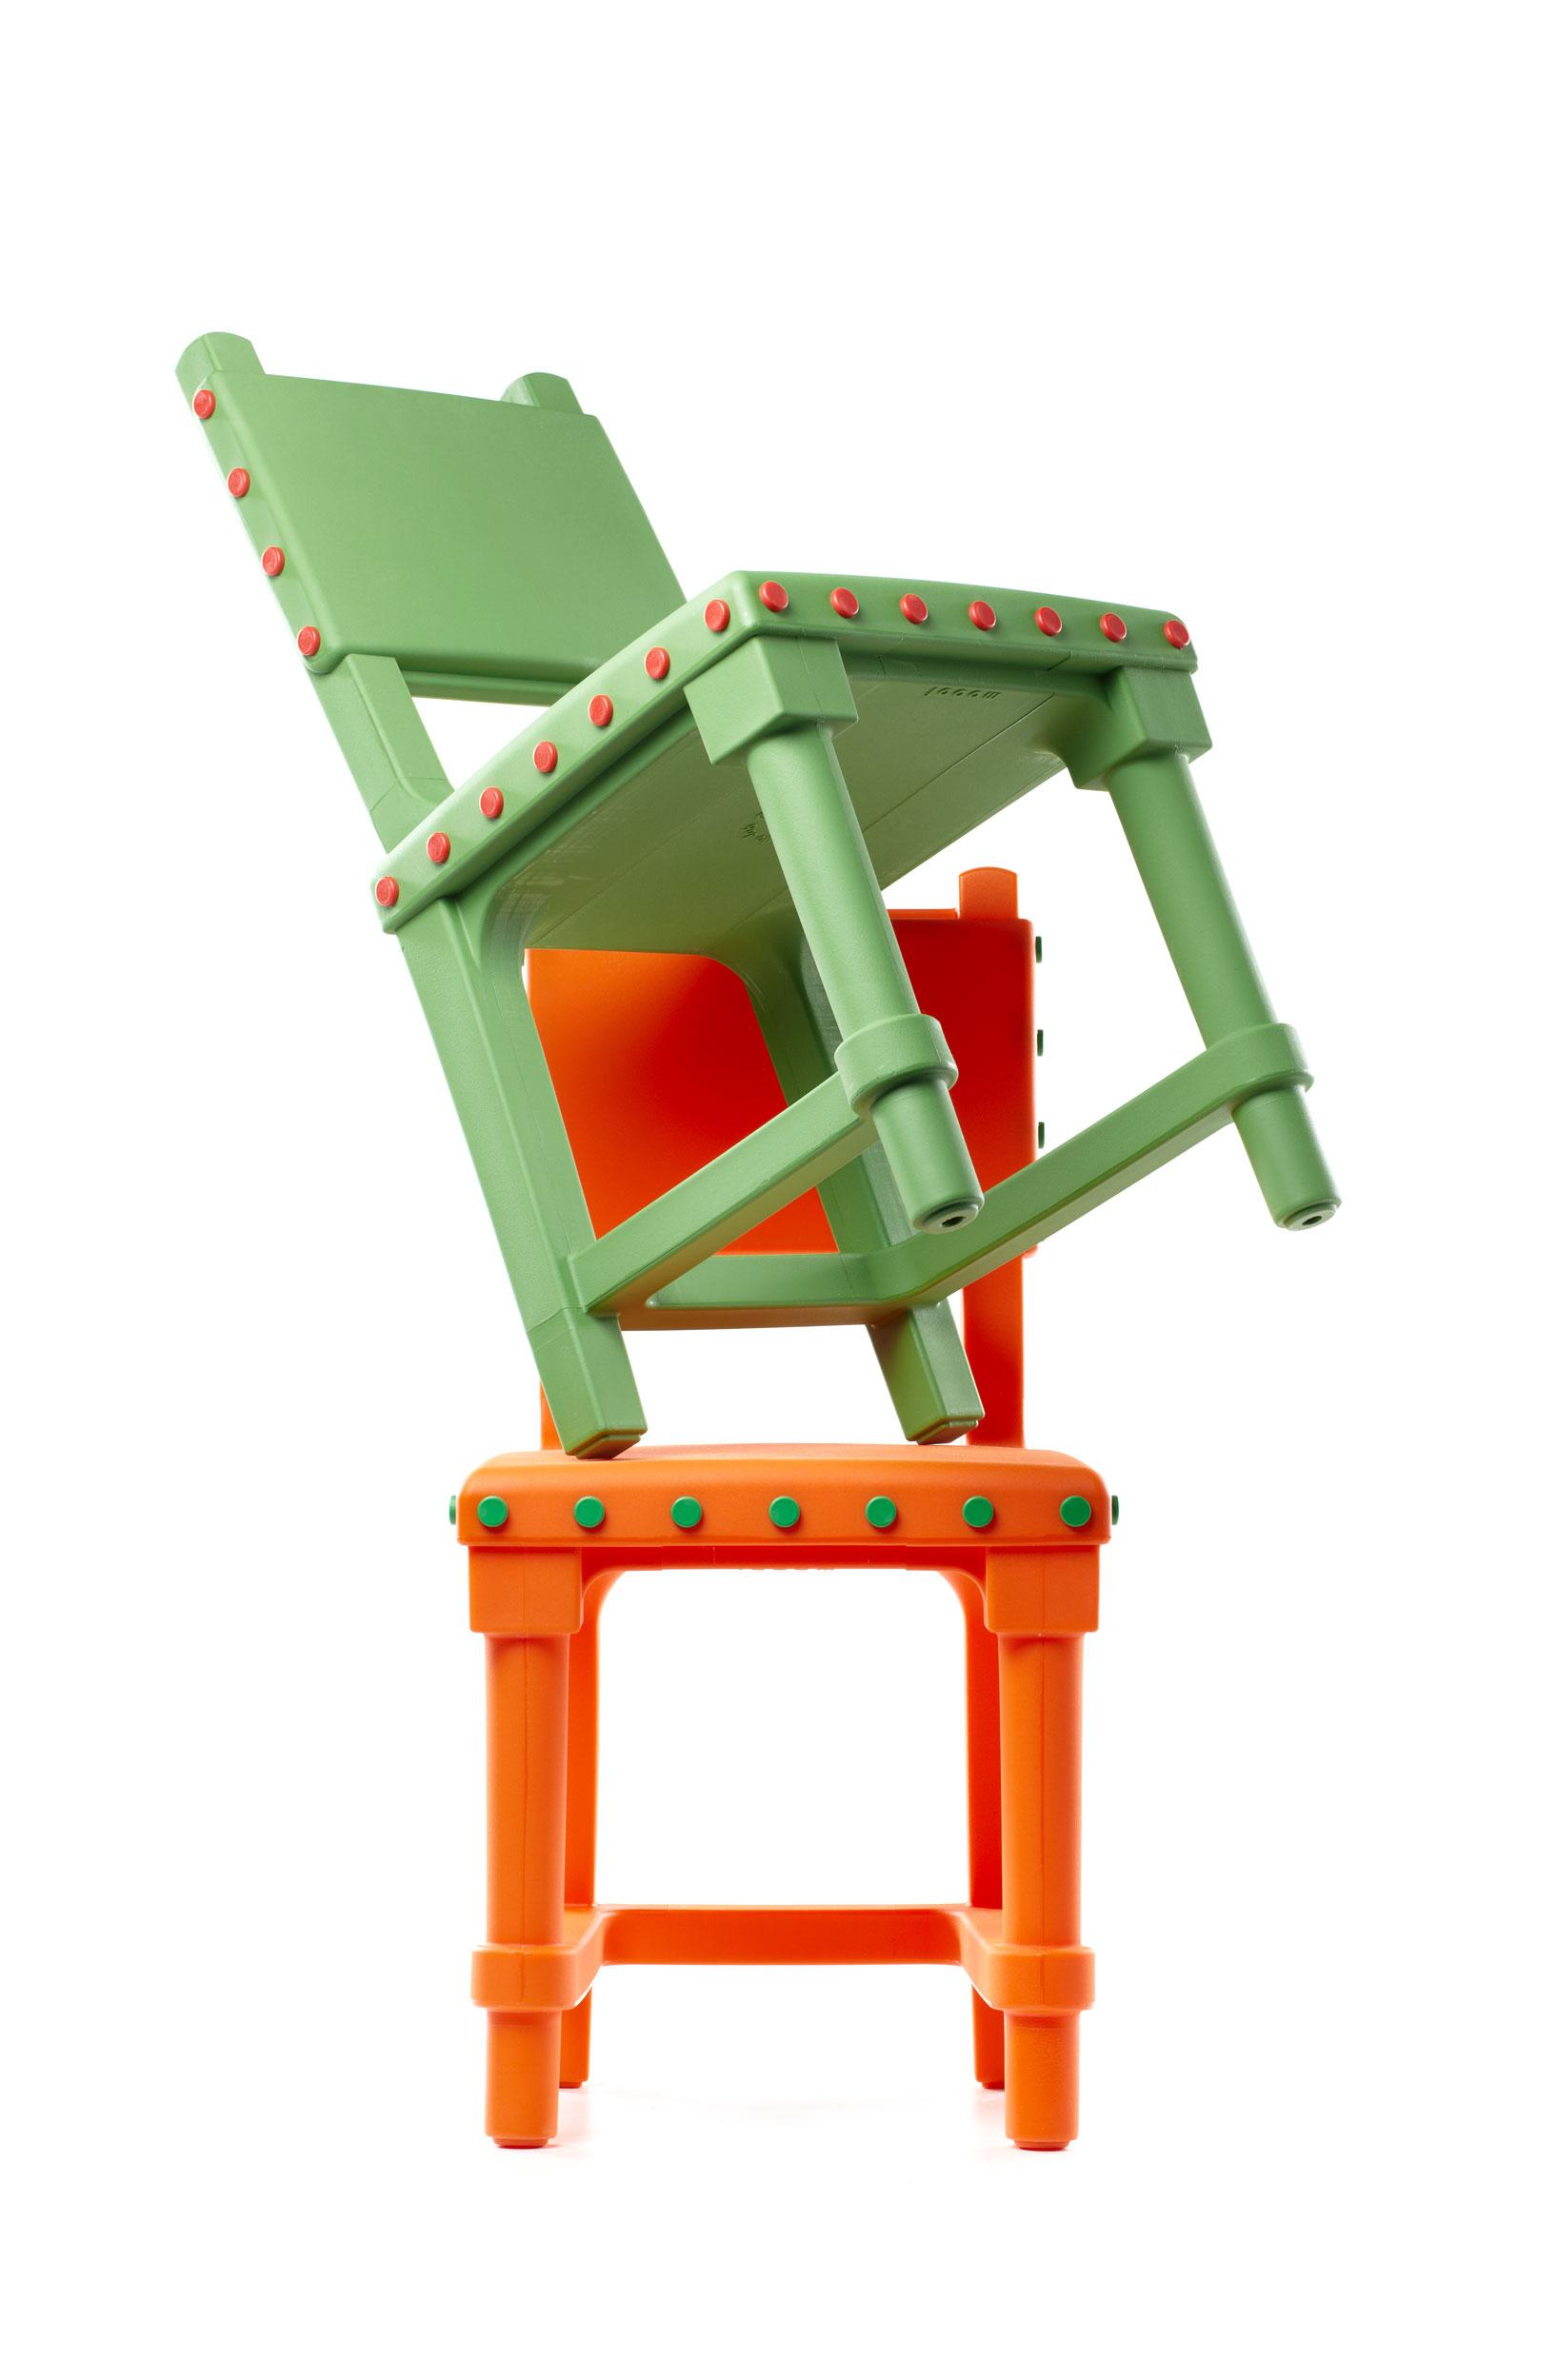 Gothicchair_group_orangegreen_1_moooi_300dpi